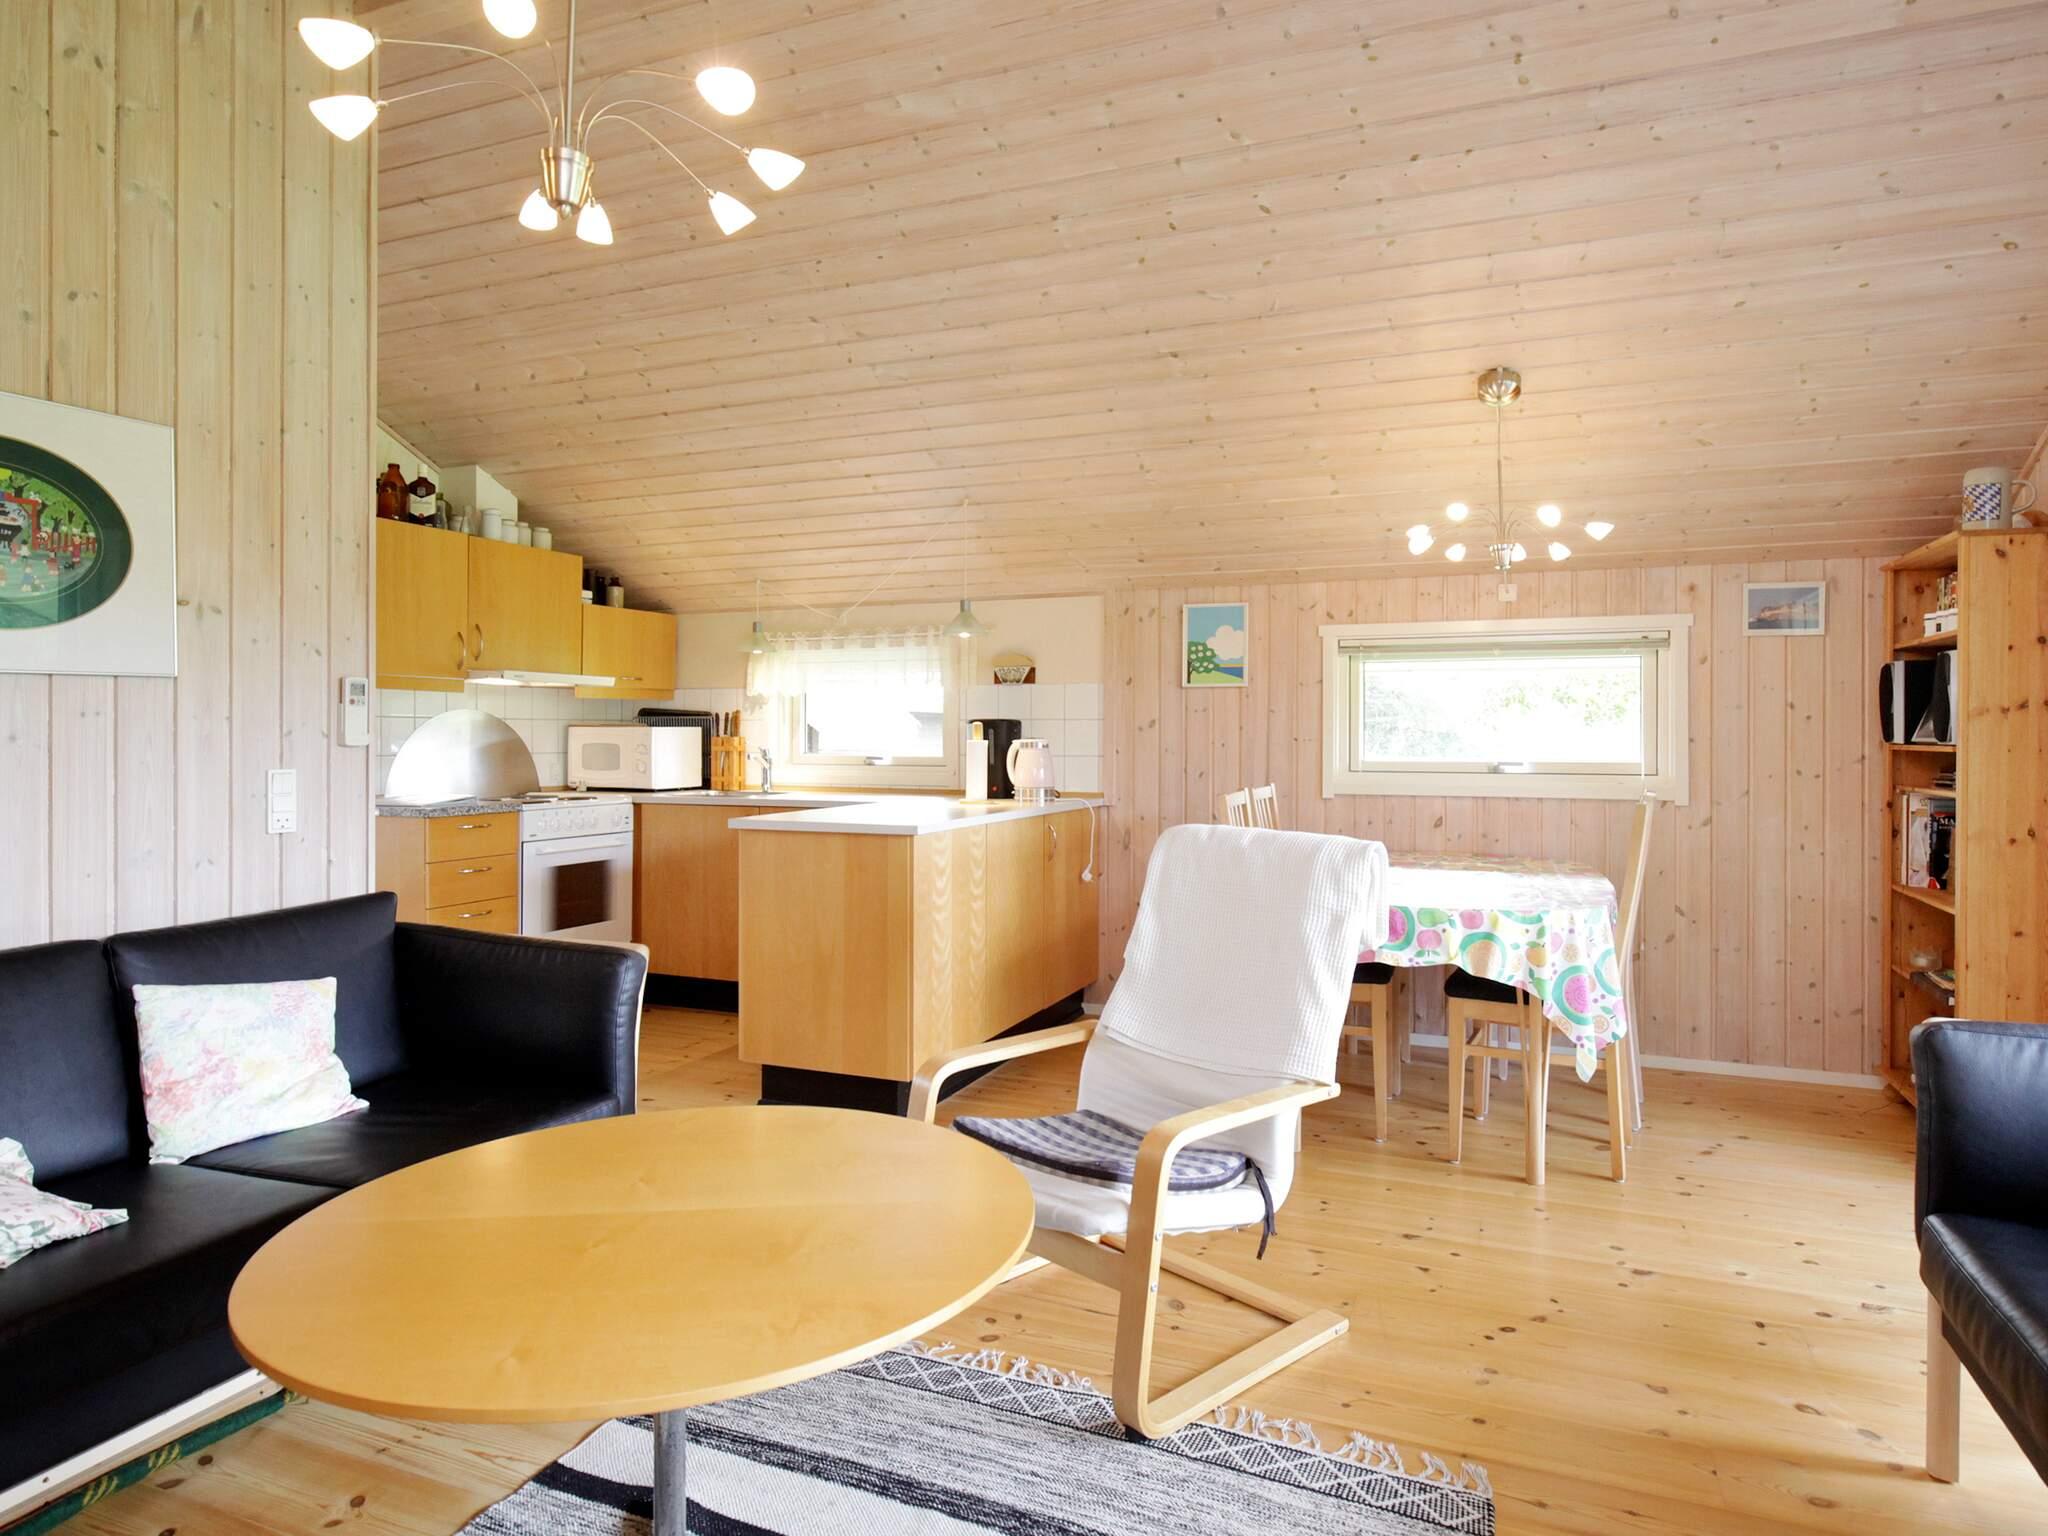 Ferienhaus Hyllingeriis (619896), Skibby, , Nordseeland, Dänemark, Bild 10